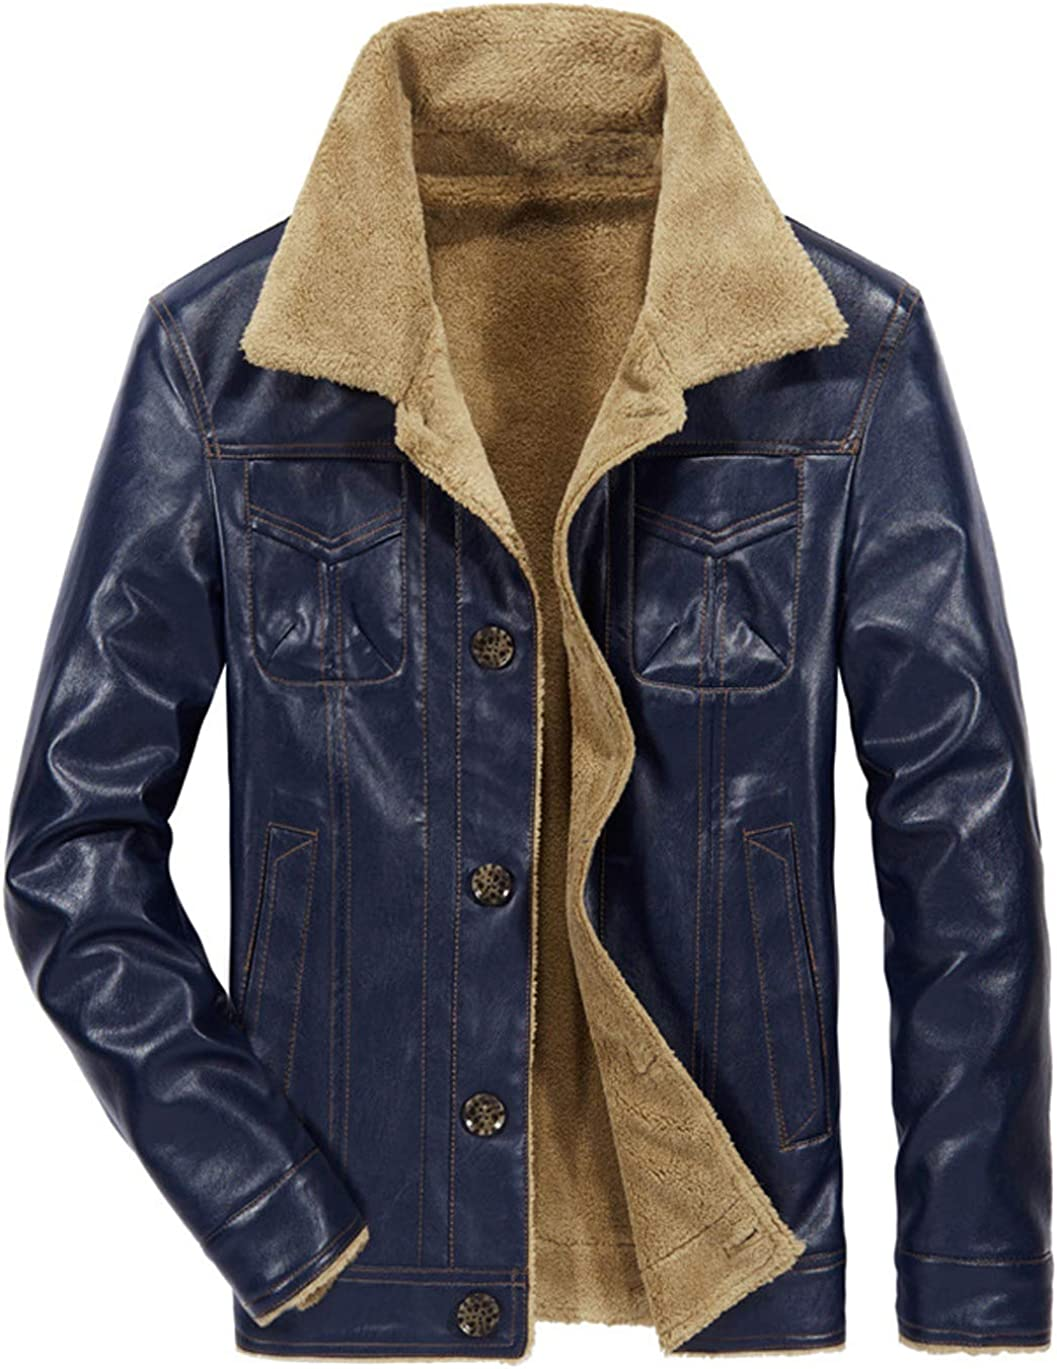 chouyatou Mens Winter Sherpa Lined Single Breasted Moto Faux Leather Trucker Jacket